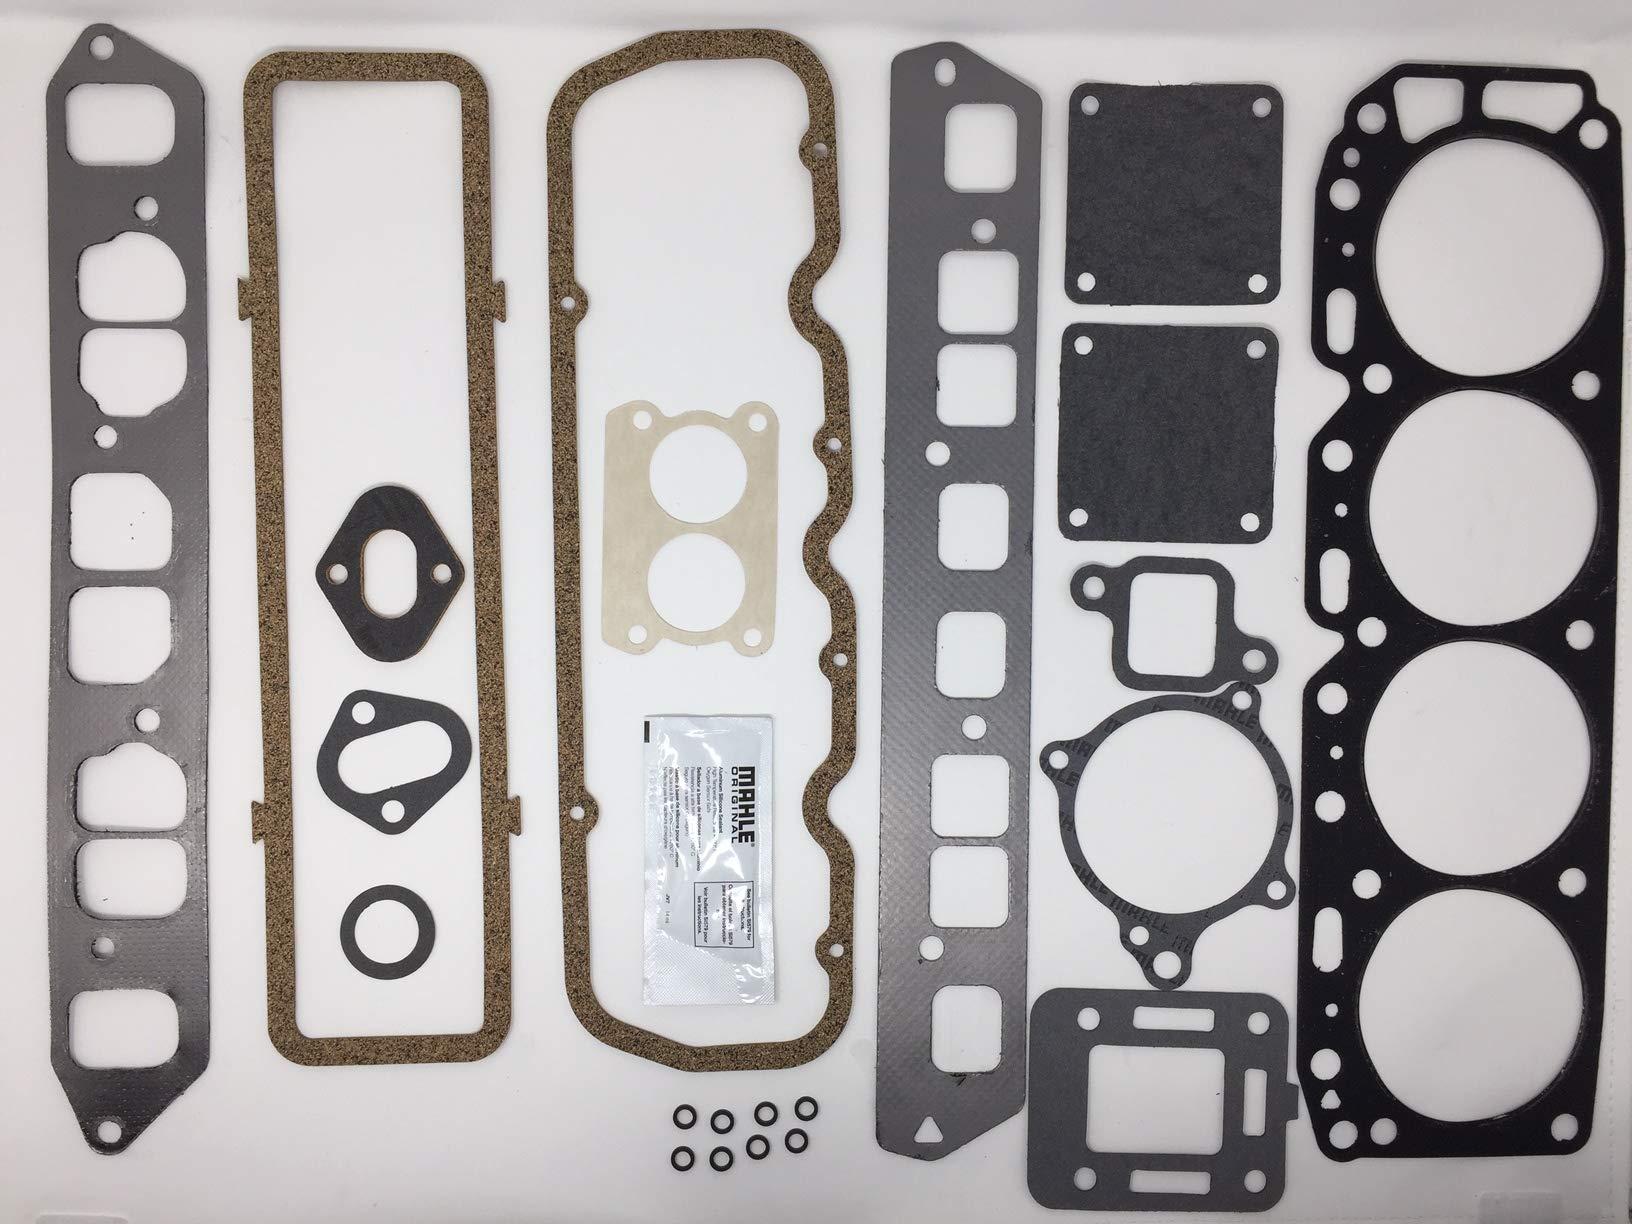 3.0L, 181 CID Mercruiser, Volvo Penta, GM Marine Overhaul Gasket Kit. Replaces Mercruiser 27-810846A05 by Marine Engines 4 Less